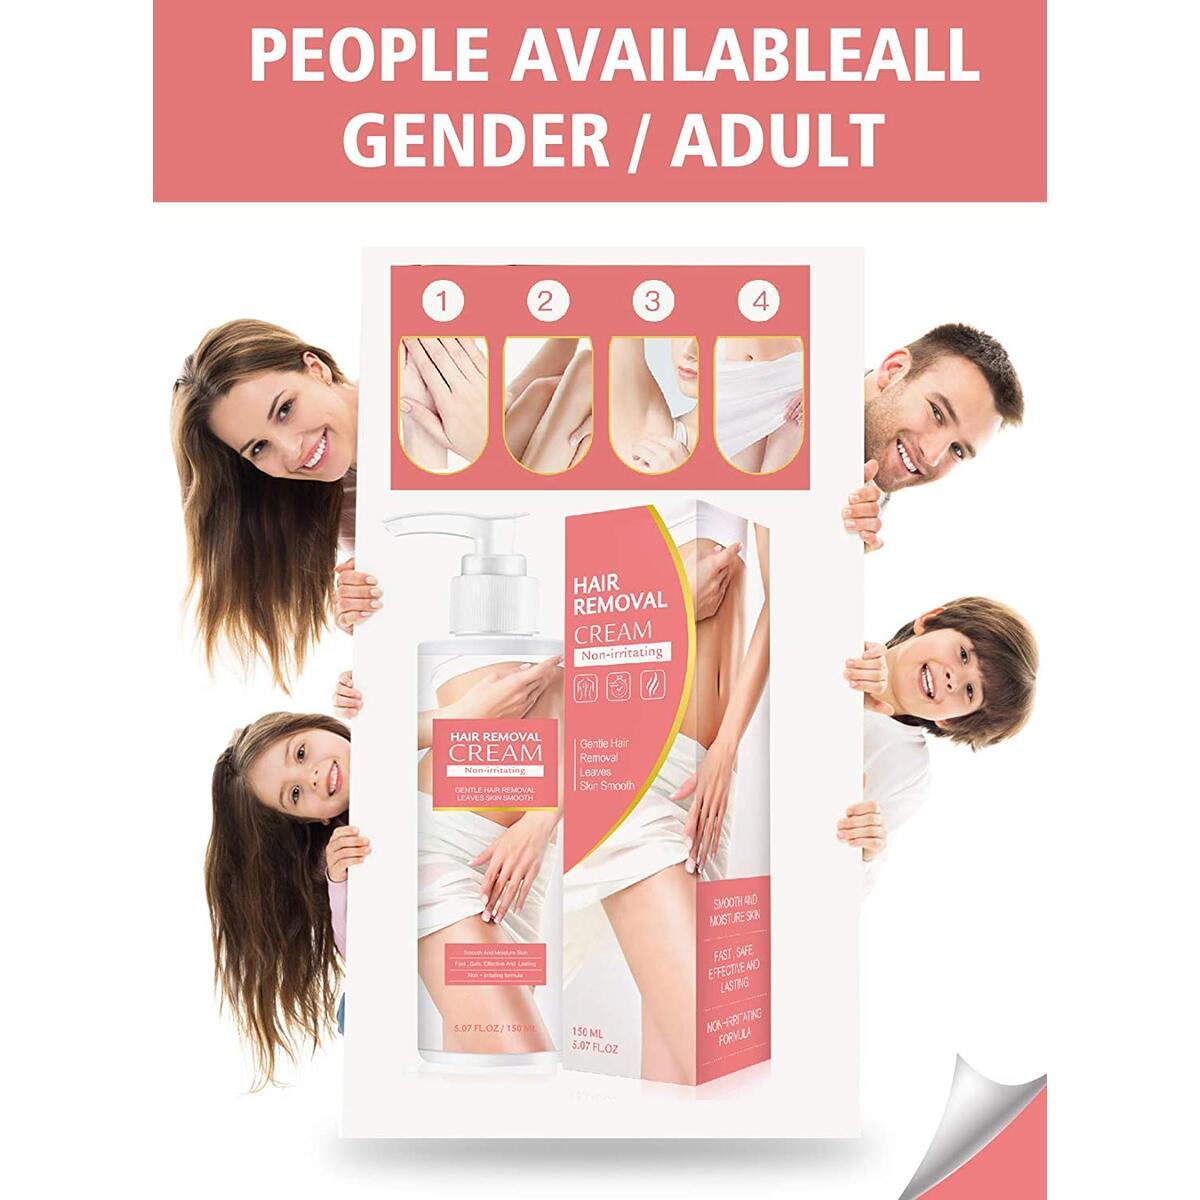 IALUKA Hair Removal Cream, 150ml Hair Remover Cream for Women and Men, Mild Ingredients, Non-Irritating Depilatory Cream for Bikini, Arm, Leg,and Armpit